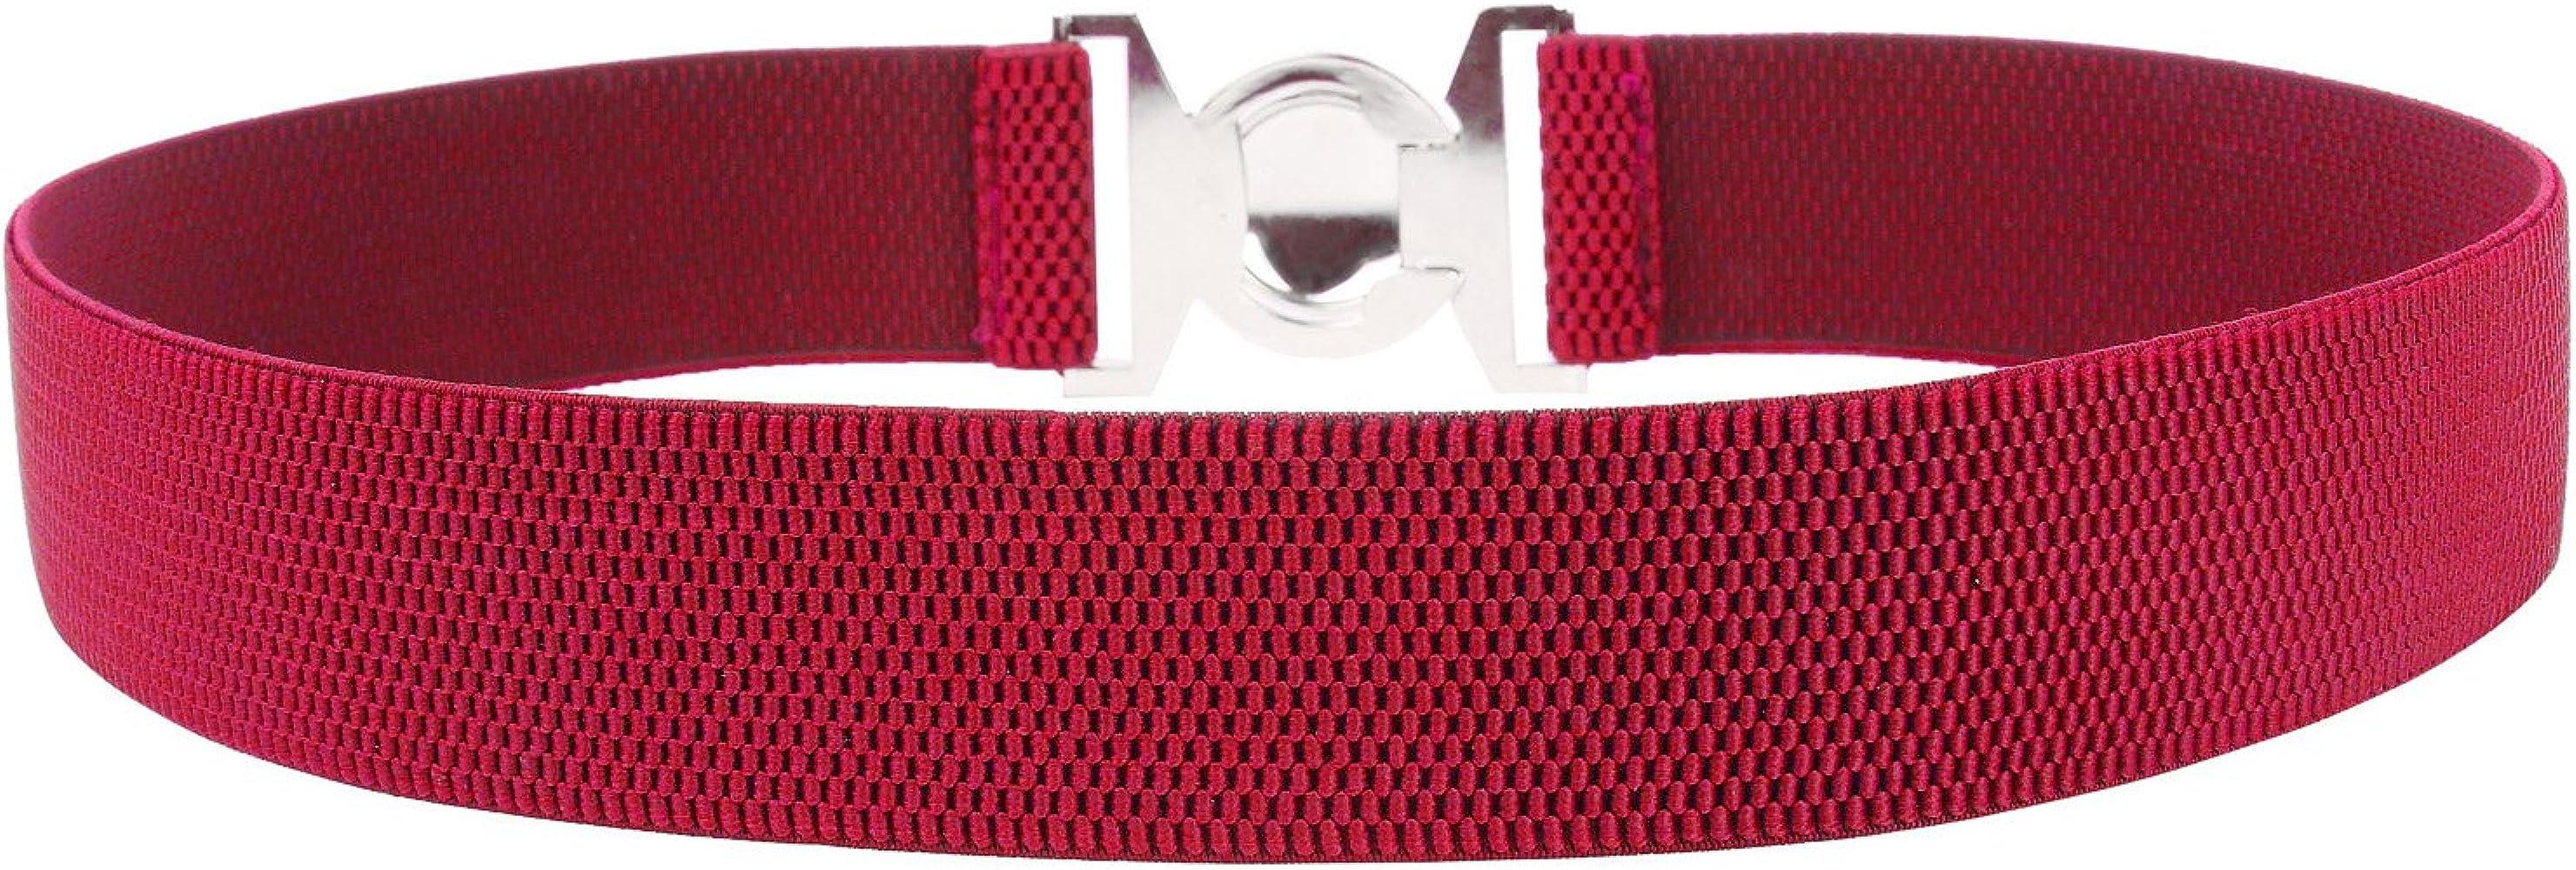 Fashion Elastic Metal Waist Belt Wide Waistband for Female Dress Accessories DI